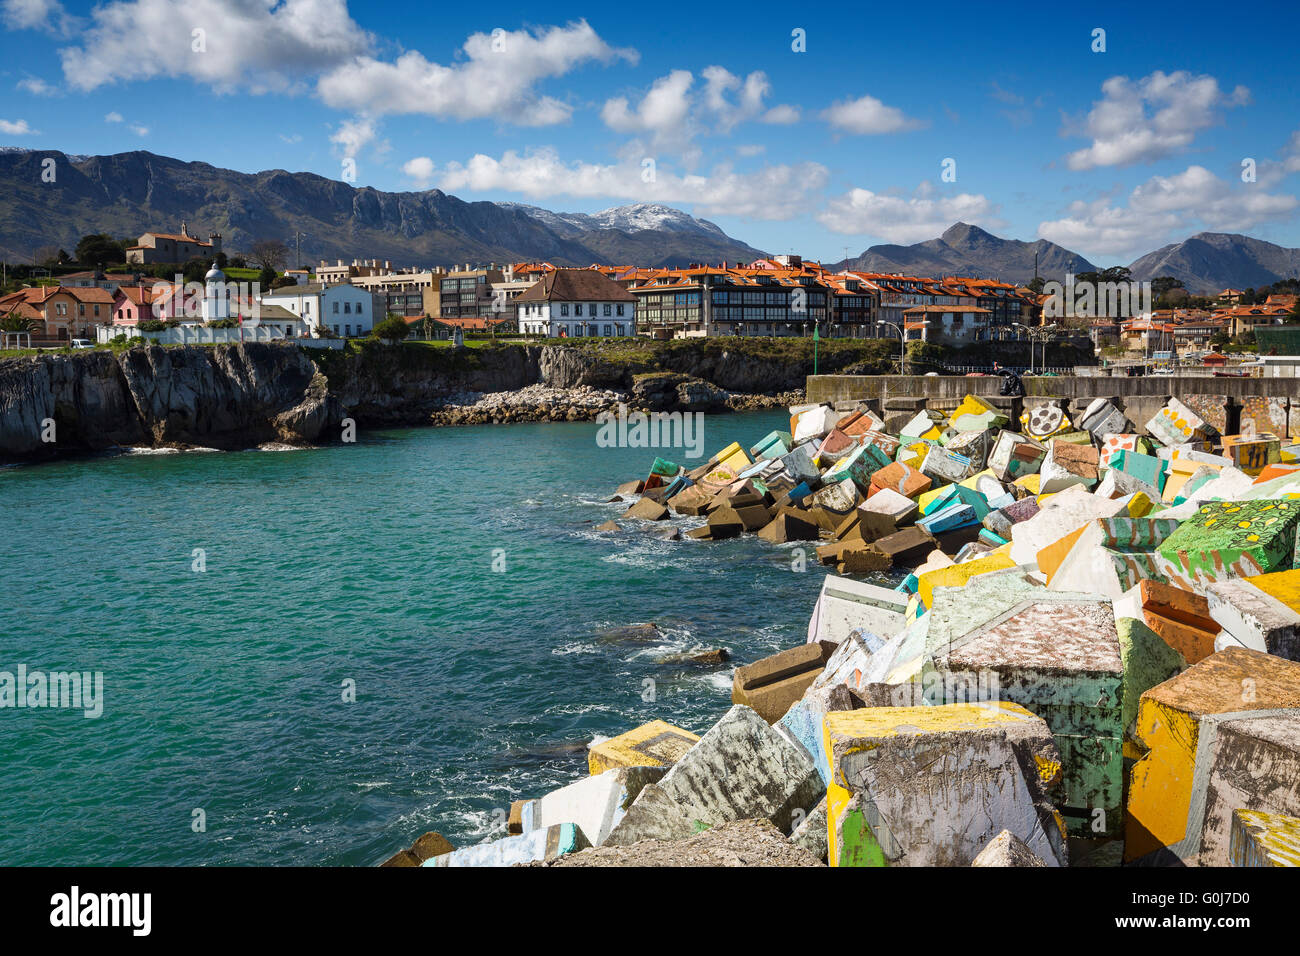 Cubos de la Memoria by artist Agustín Ibarrola.Fishing port Marina. Fishing village of Llanes, Cantabrian Sea, - Stock Image